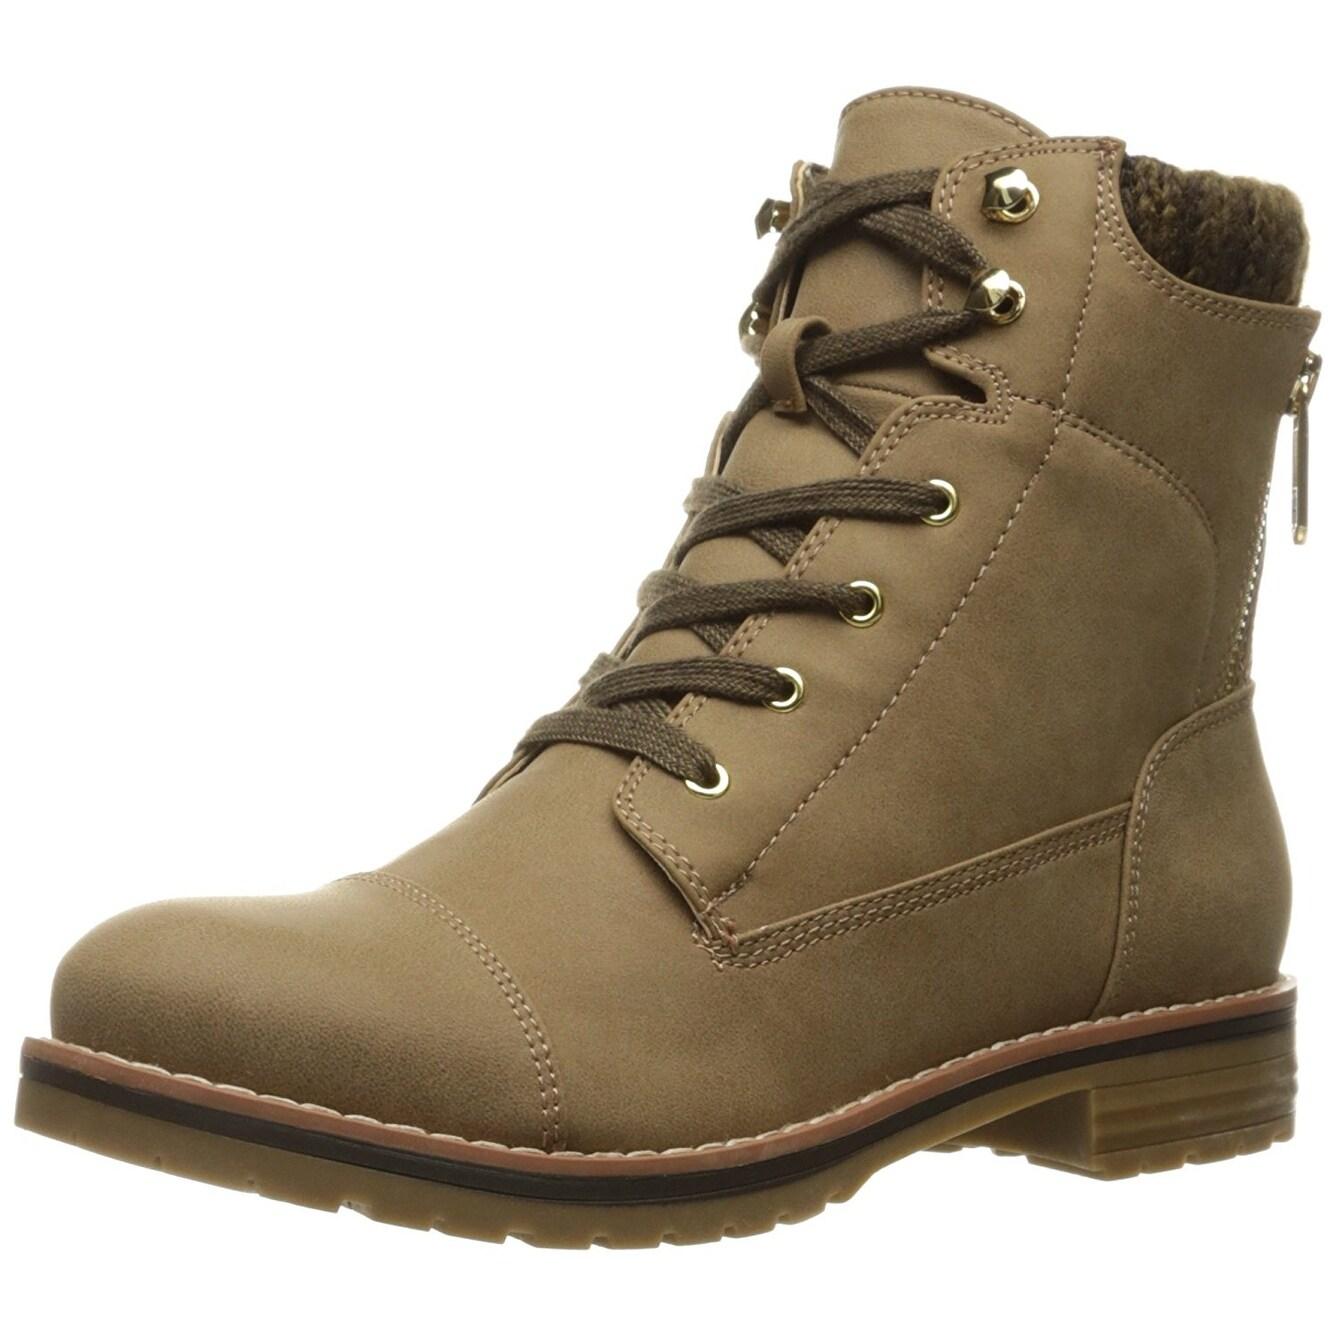 ea1cdb7fb2b51 Shop Tommy Hilfiger Womens Omar2 Closed Toe Ankle Combat Boots ...